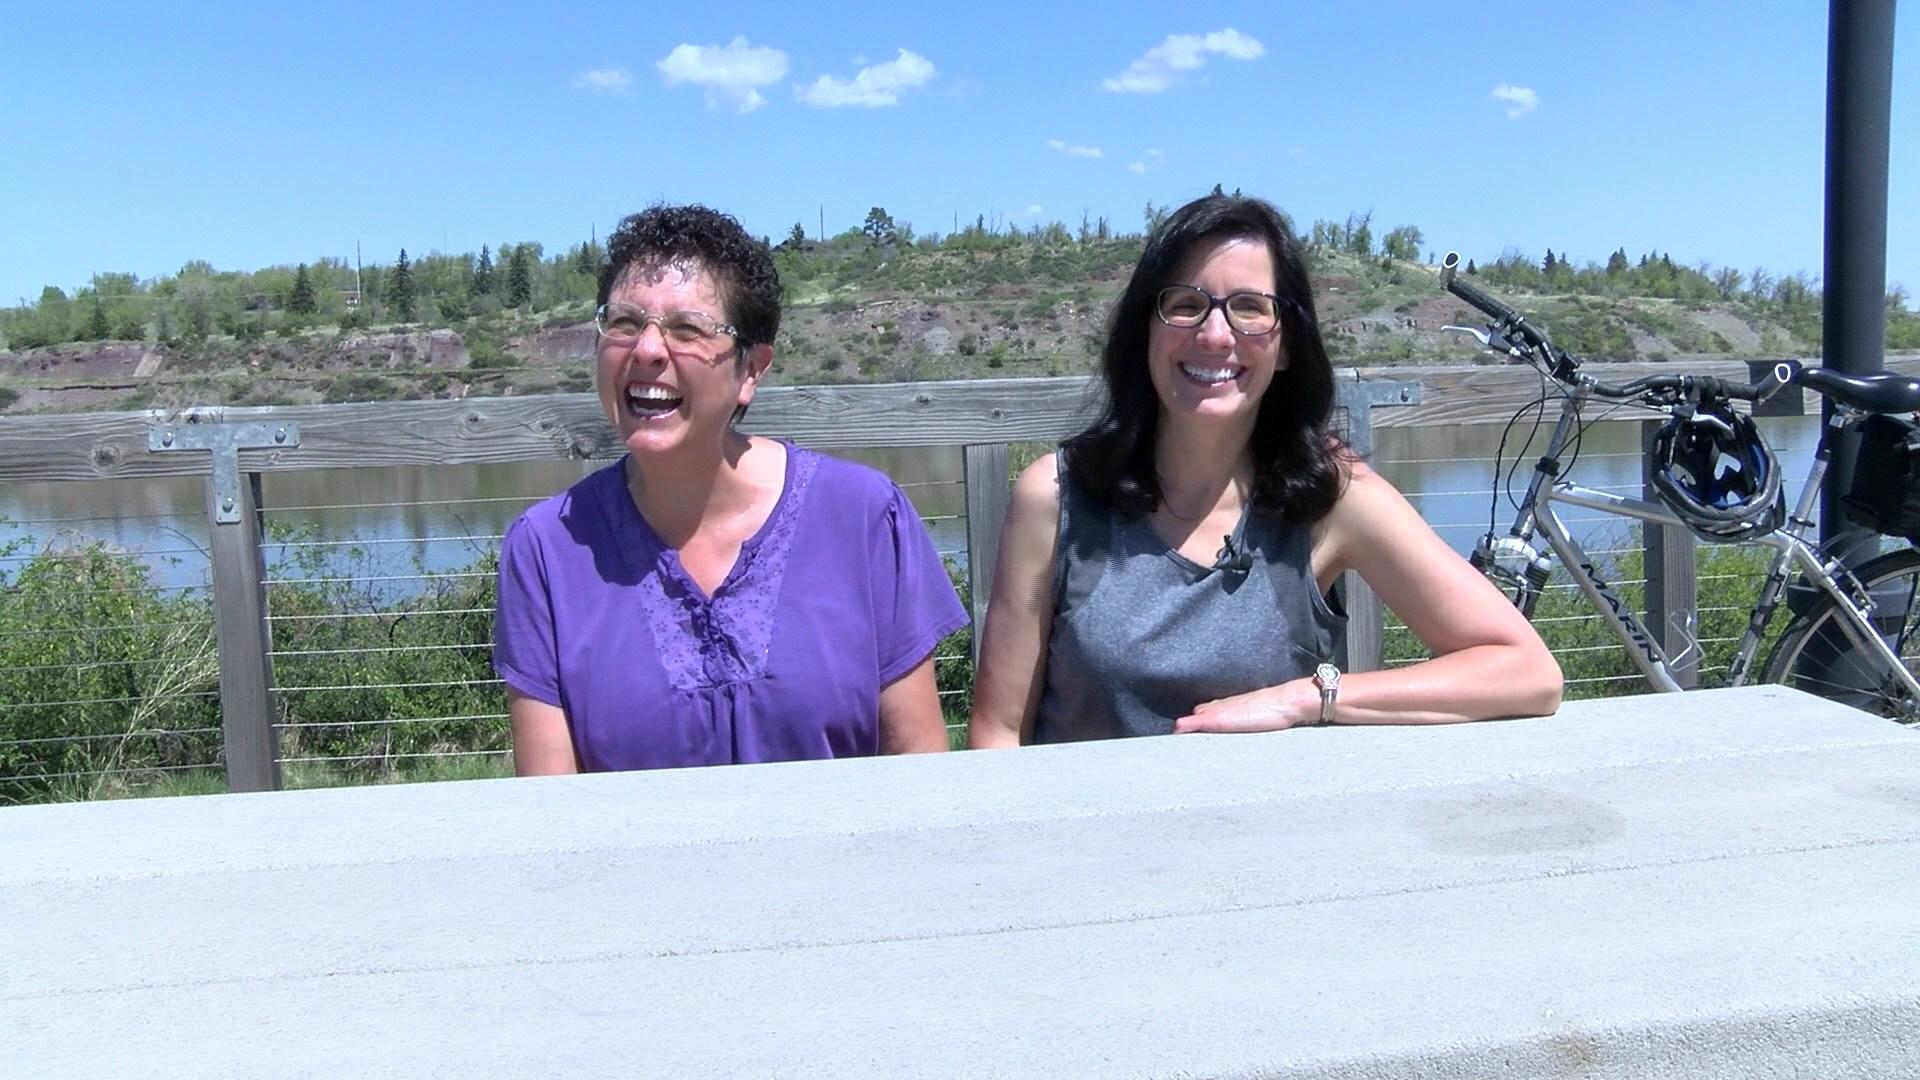 Nancy Ocheltree and Kitty Bergan call themselves the Montana Grannies